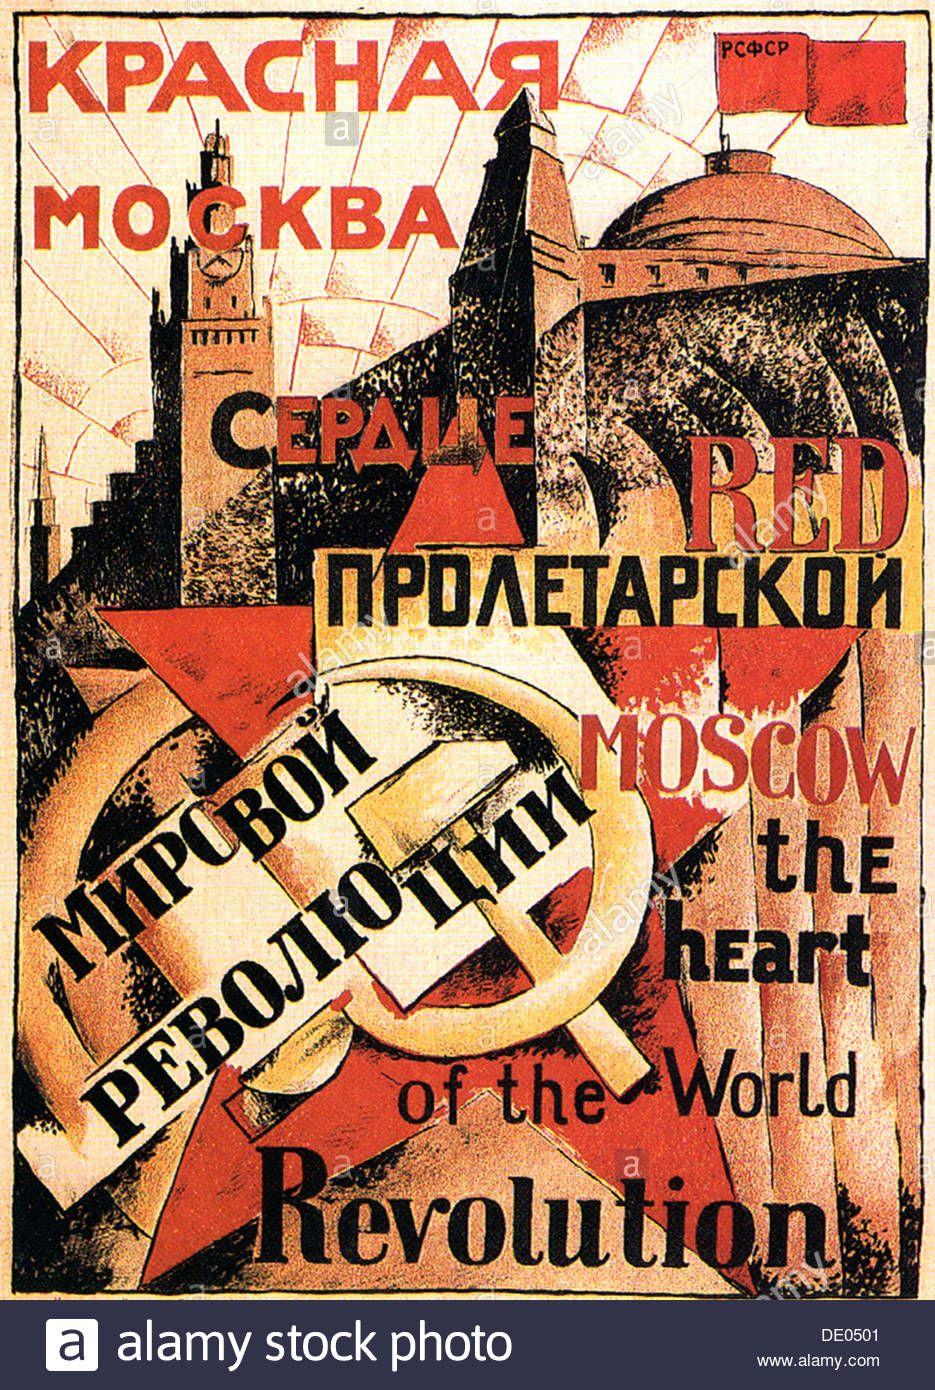 Russian Revolution Poster Stock Photos Russian Revolution Poster Stock Images Alamy Propaganda Posters Propaganda Art Propaganda